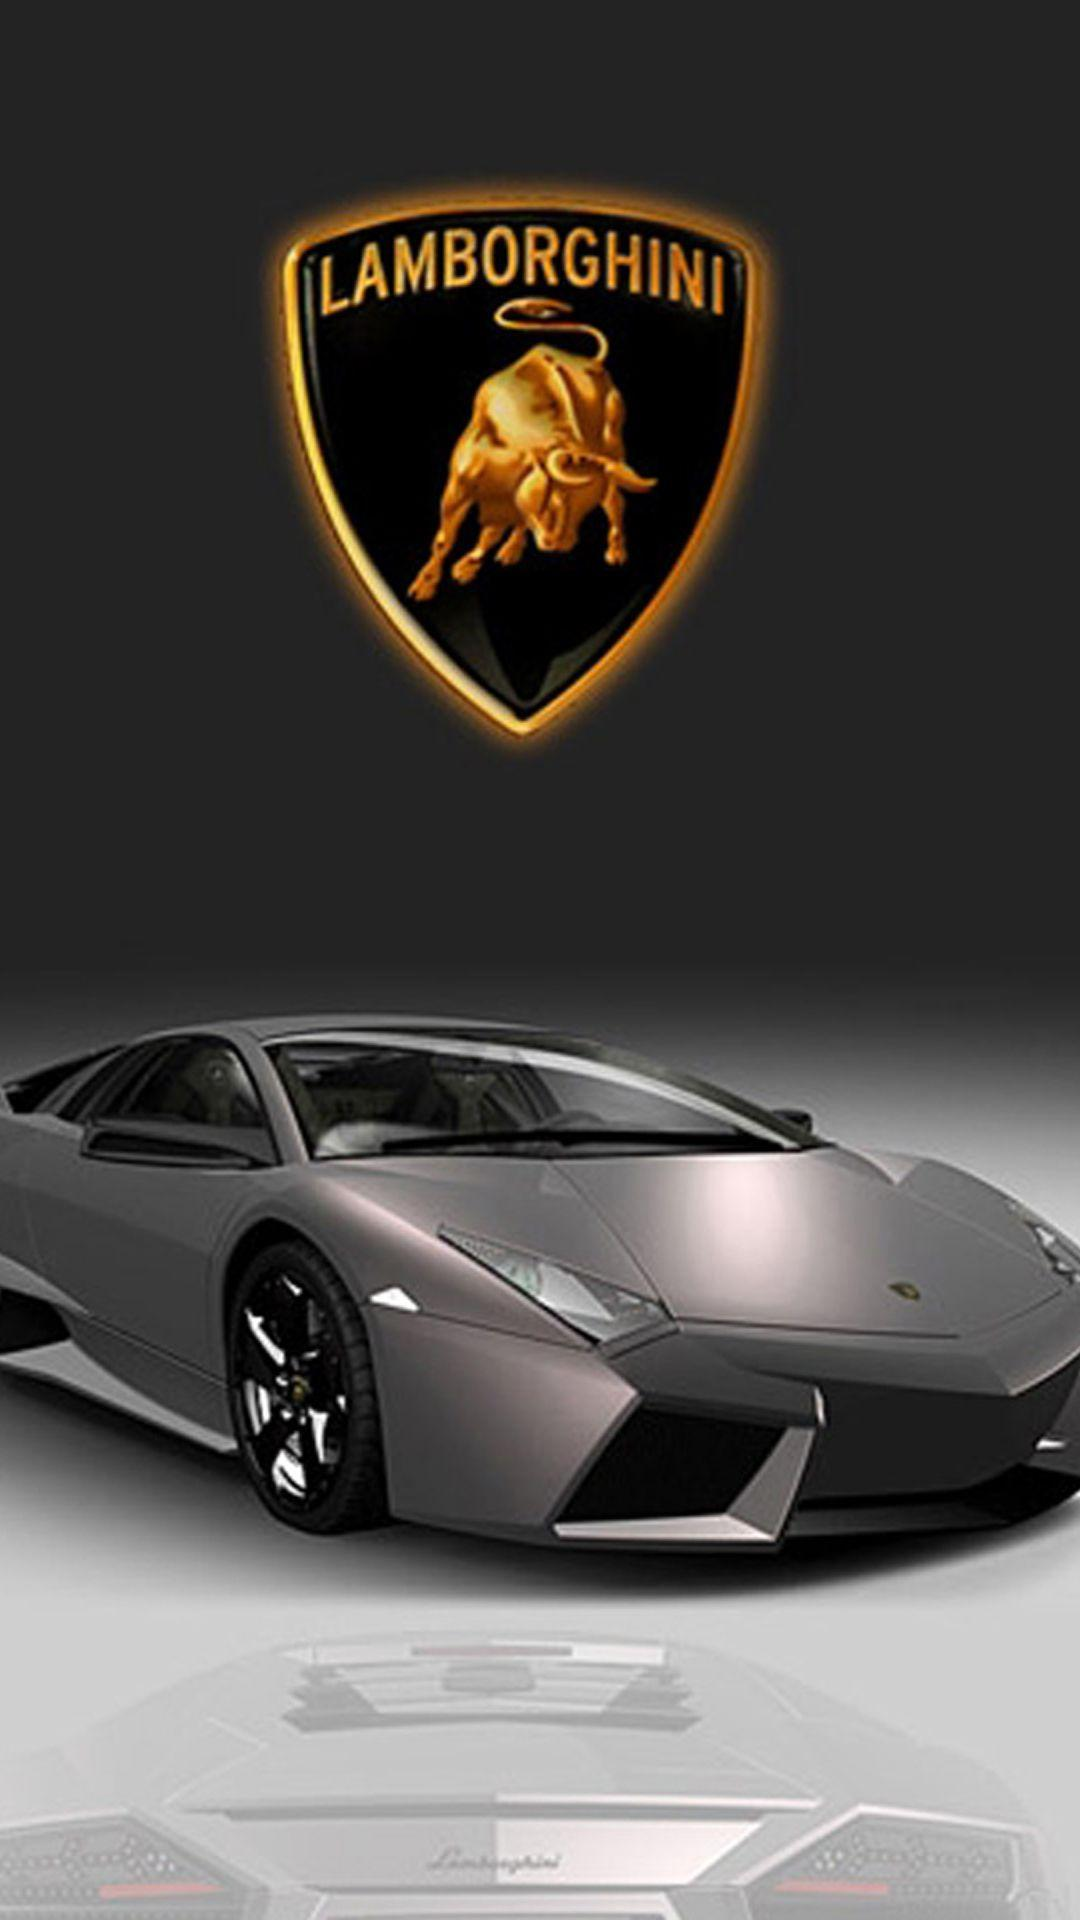 Lamborghini Iphone Wallpapers Top Free Lamborghini Iphone